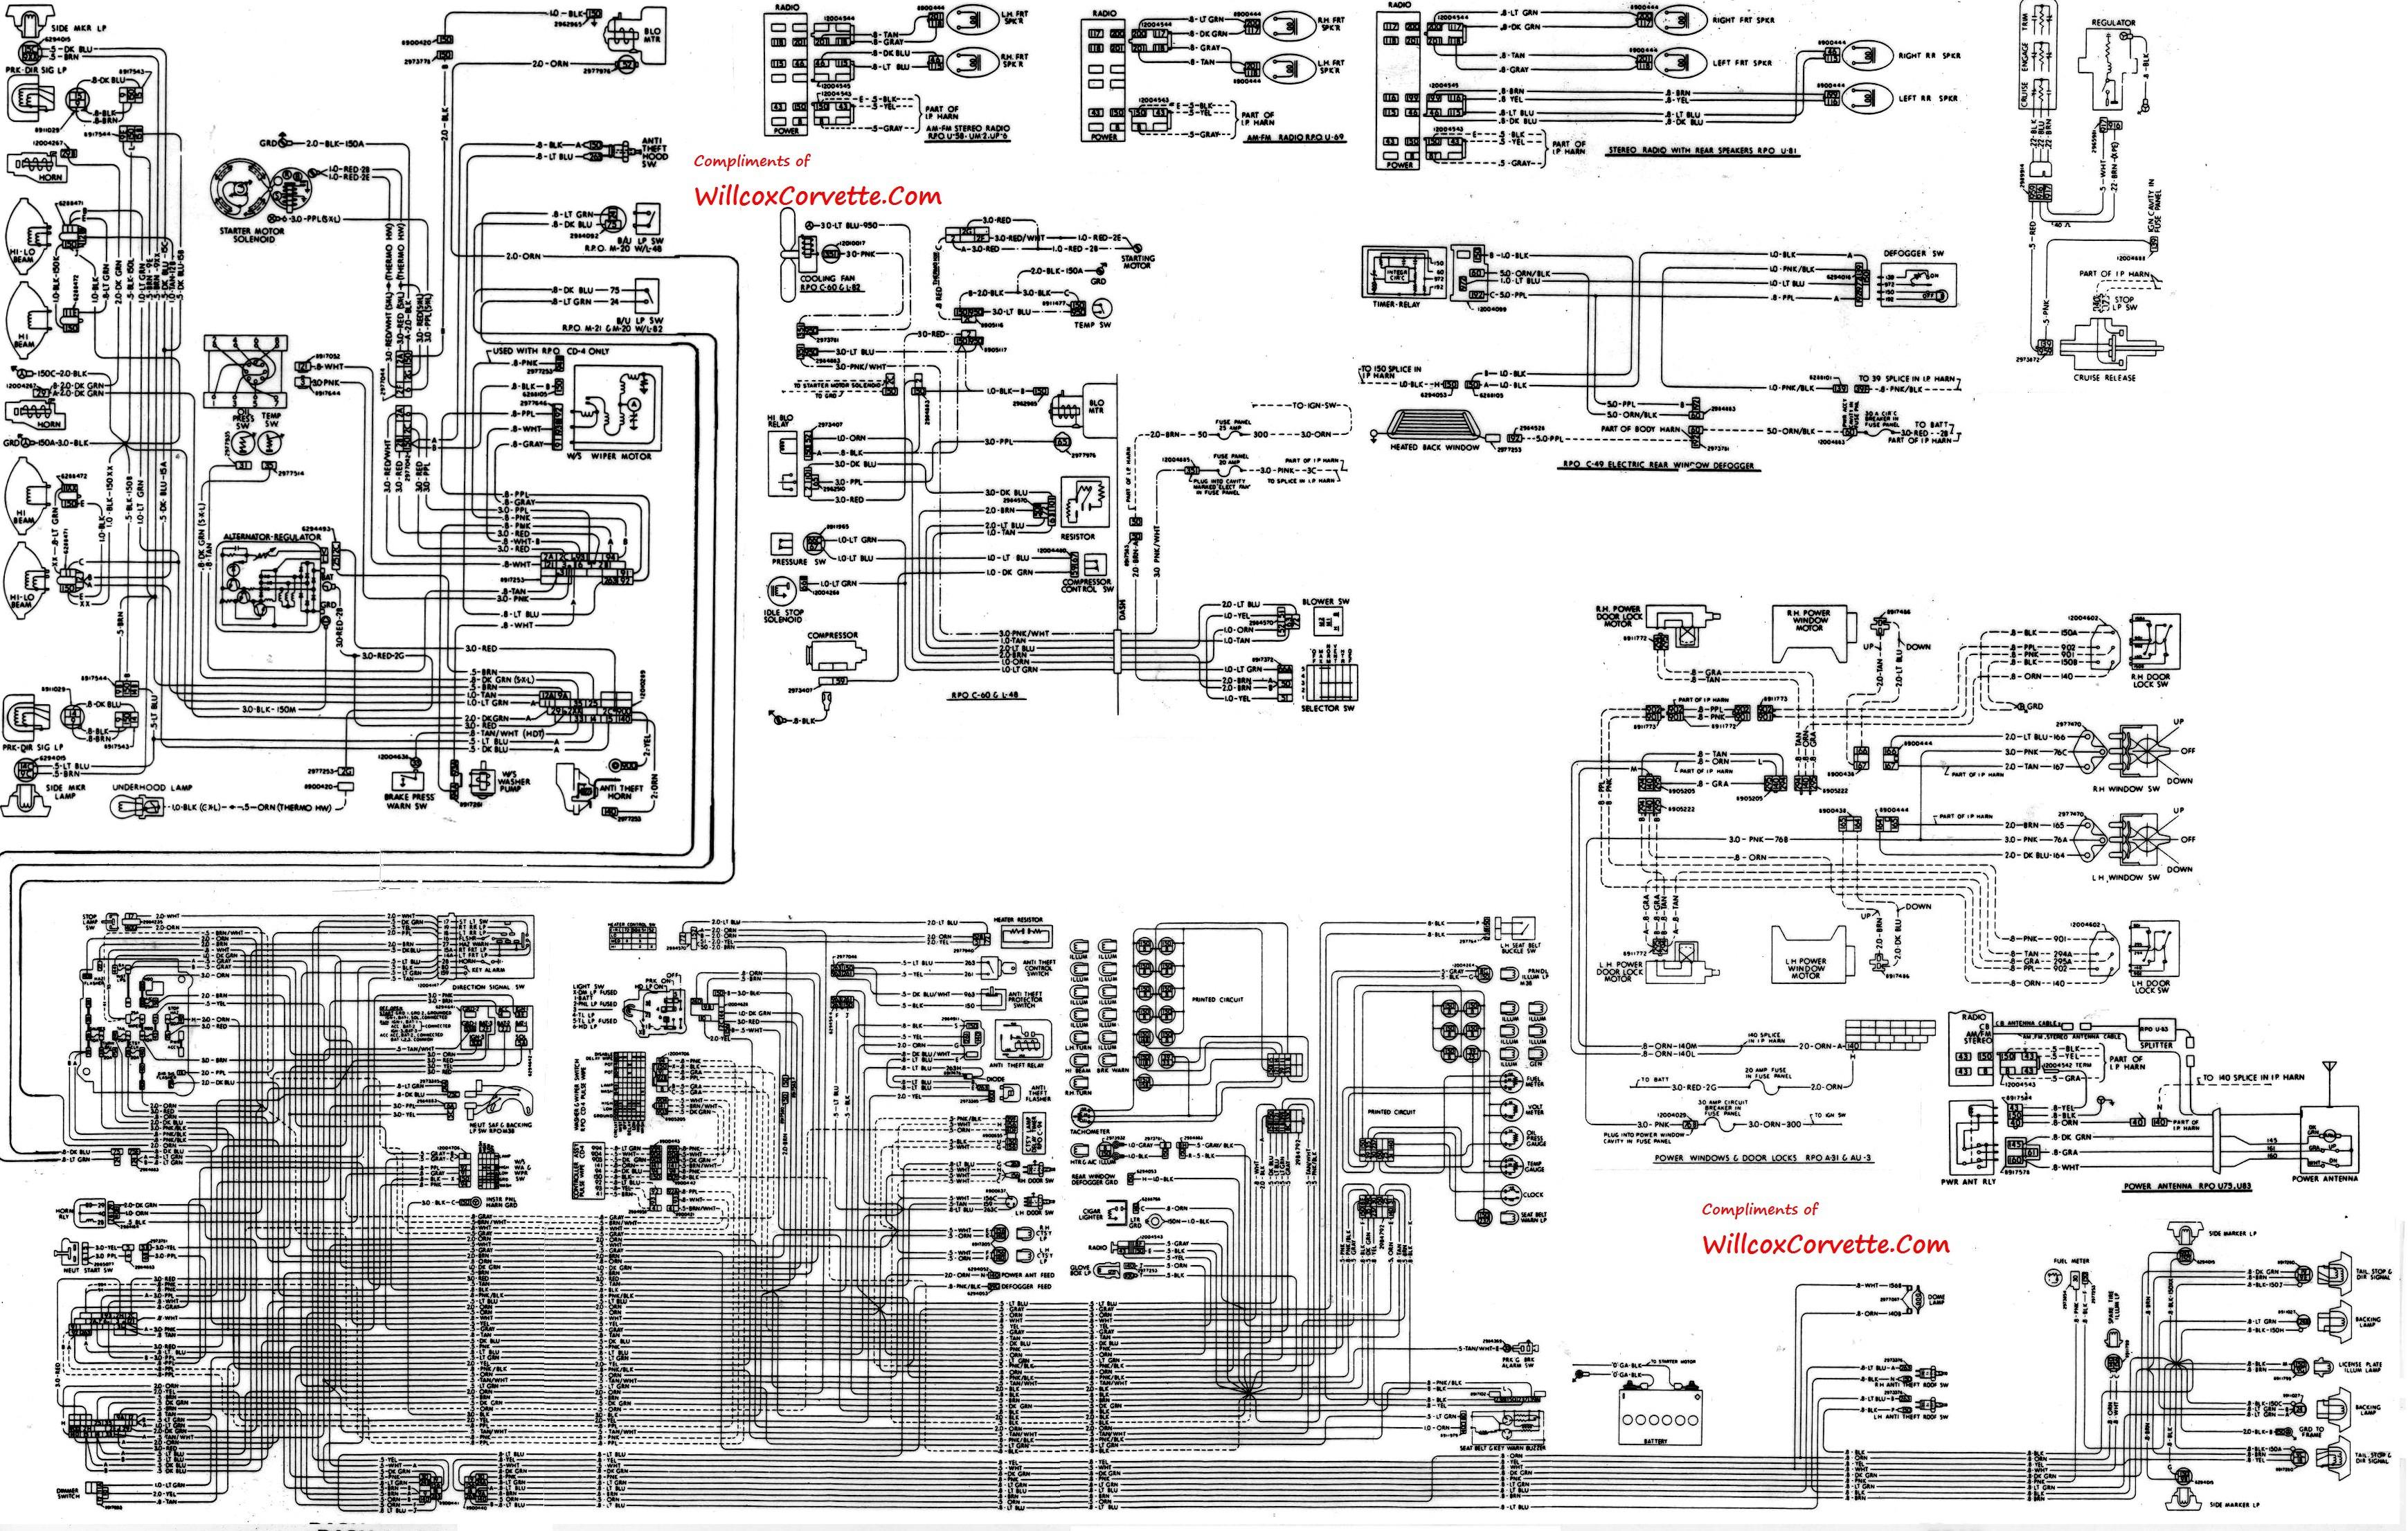 Perfect Bulldog 791 Wiring Diagram Pattern - Simple Wiring Diagram ...